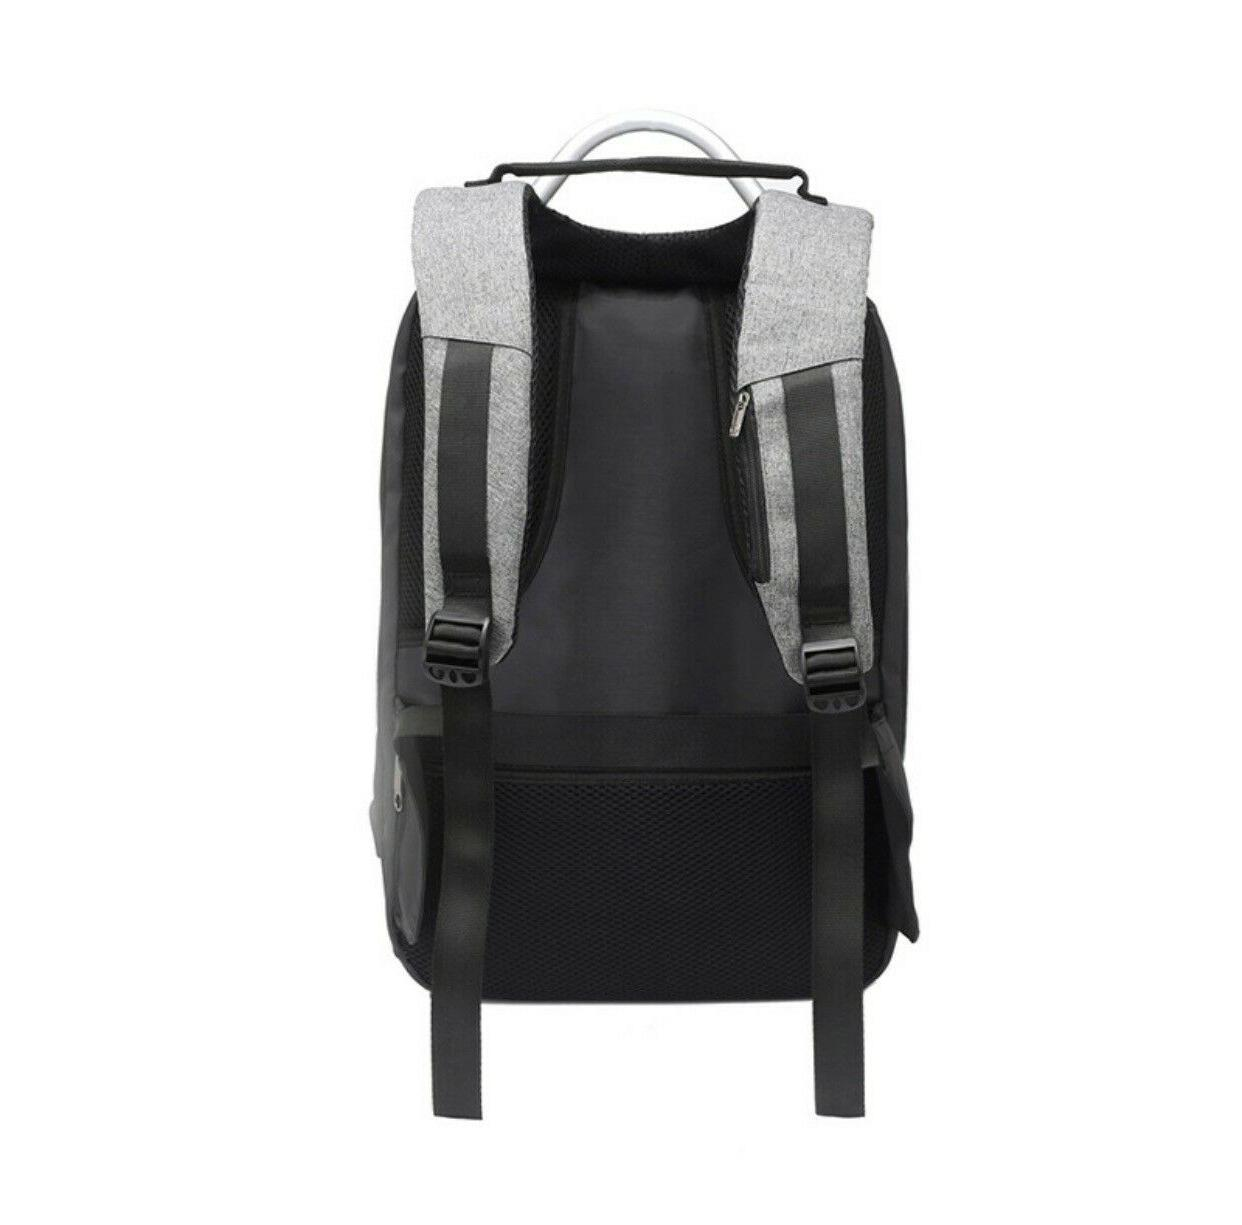 New Anti Theft Bagpack